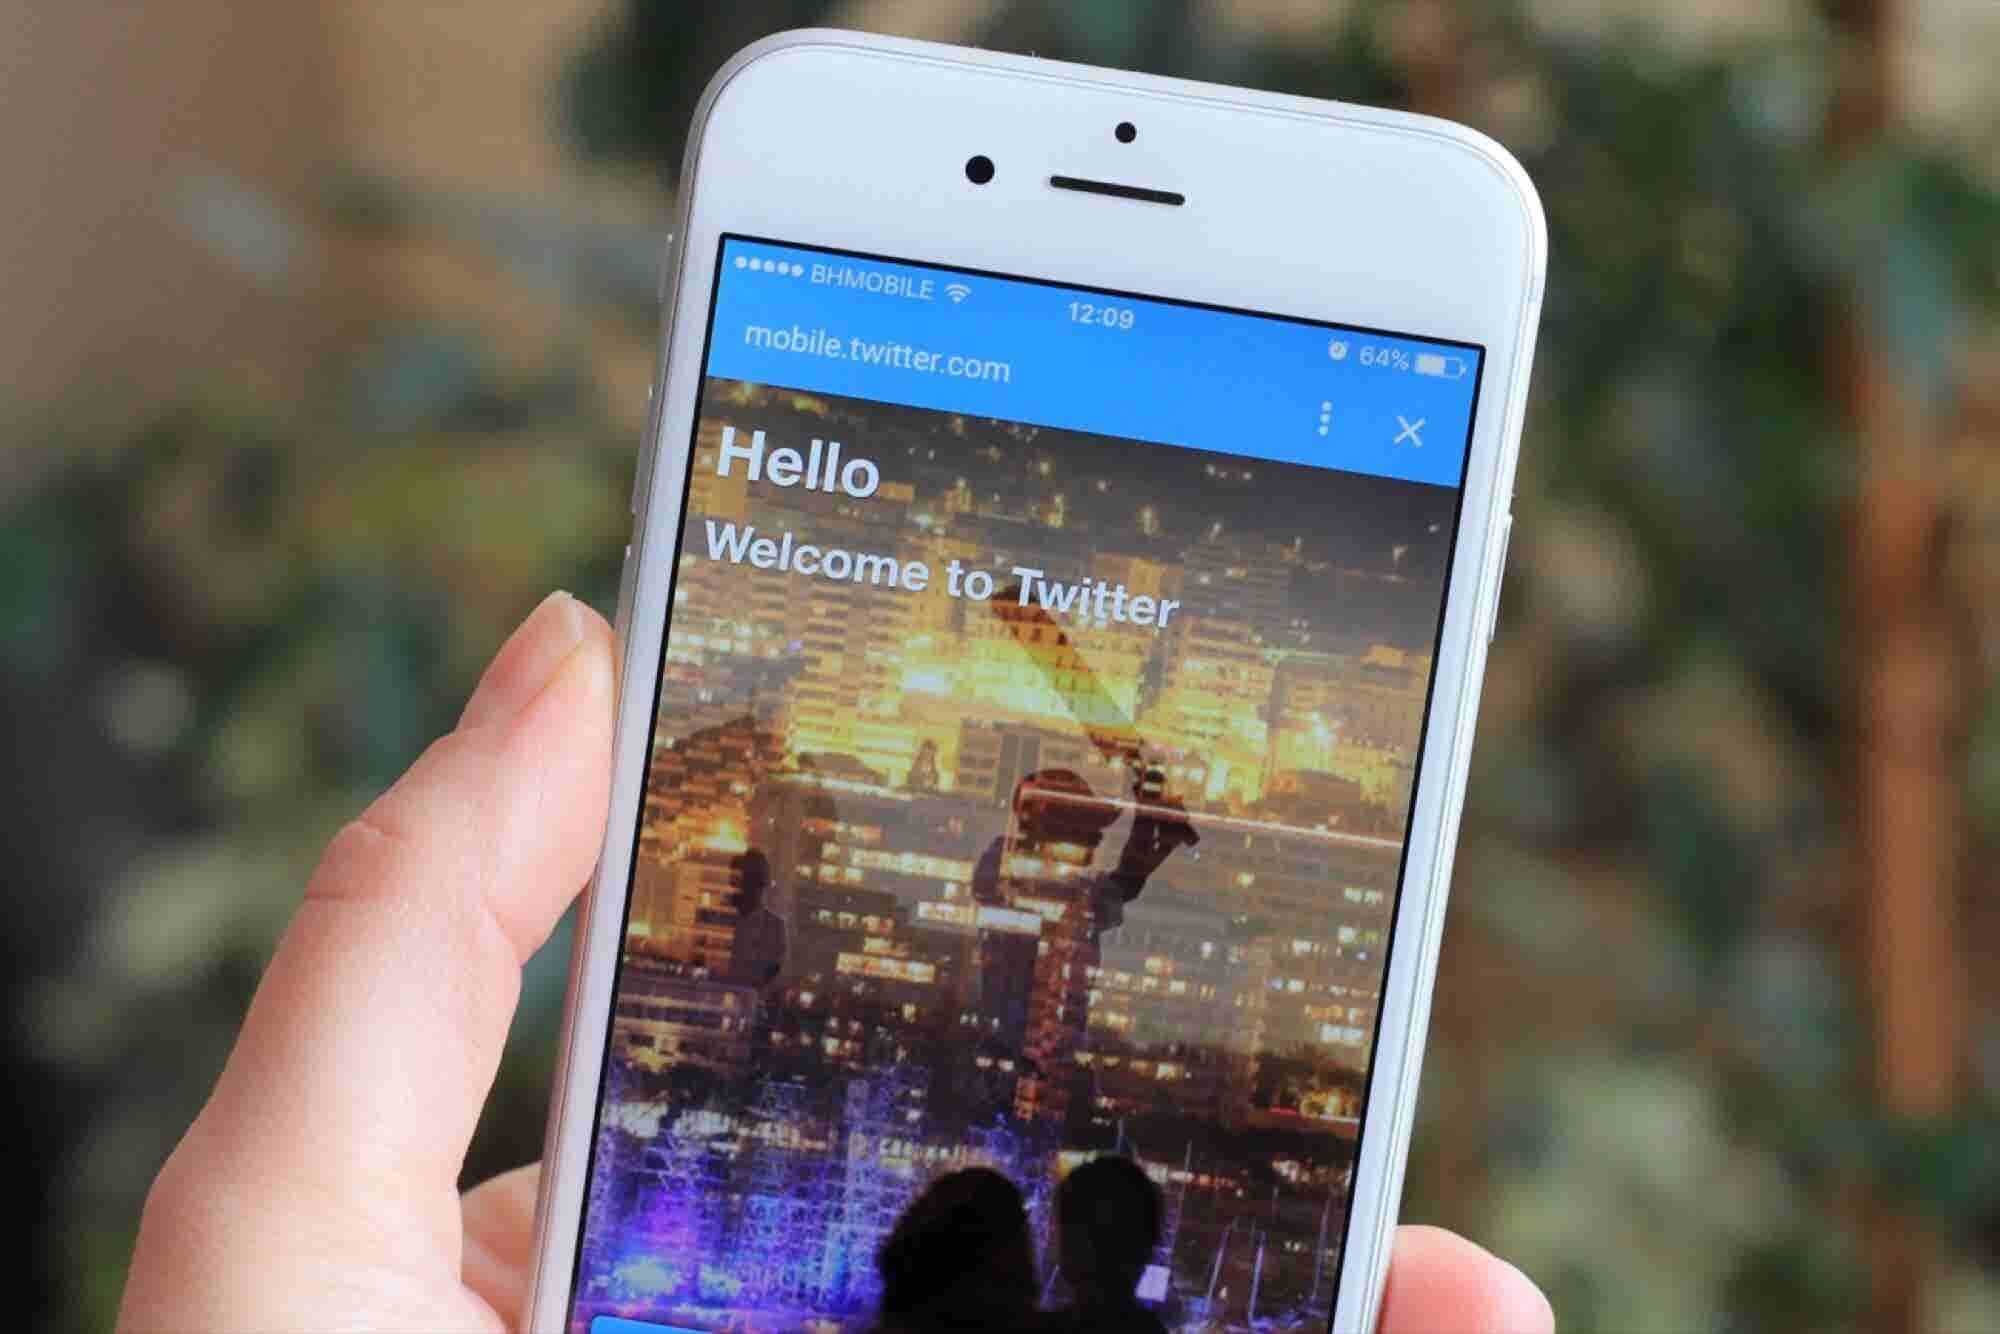 Twitter Makes it Easier for iOS Users to Tweet in the Dark